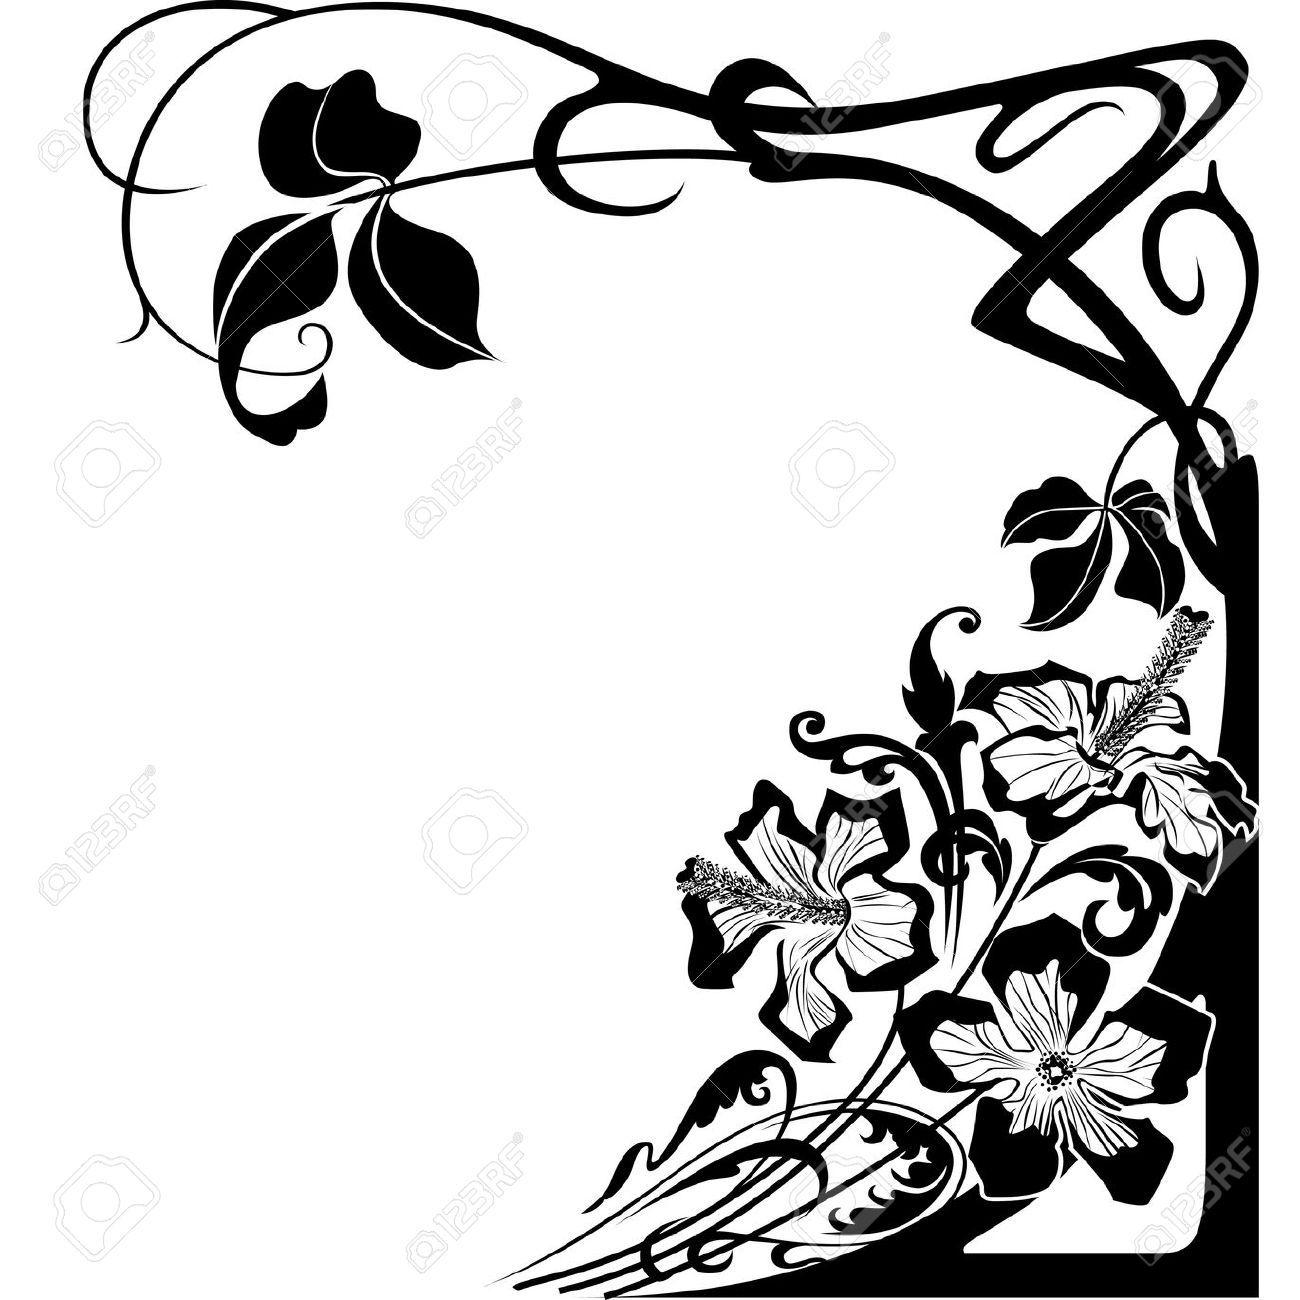 Art Nouveau Images, Stock Pictures, Royalty Free Art